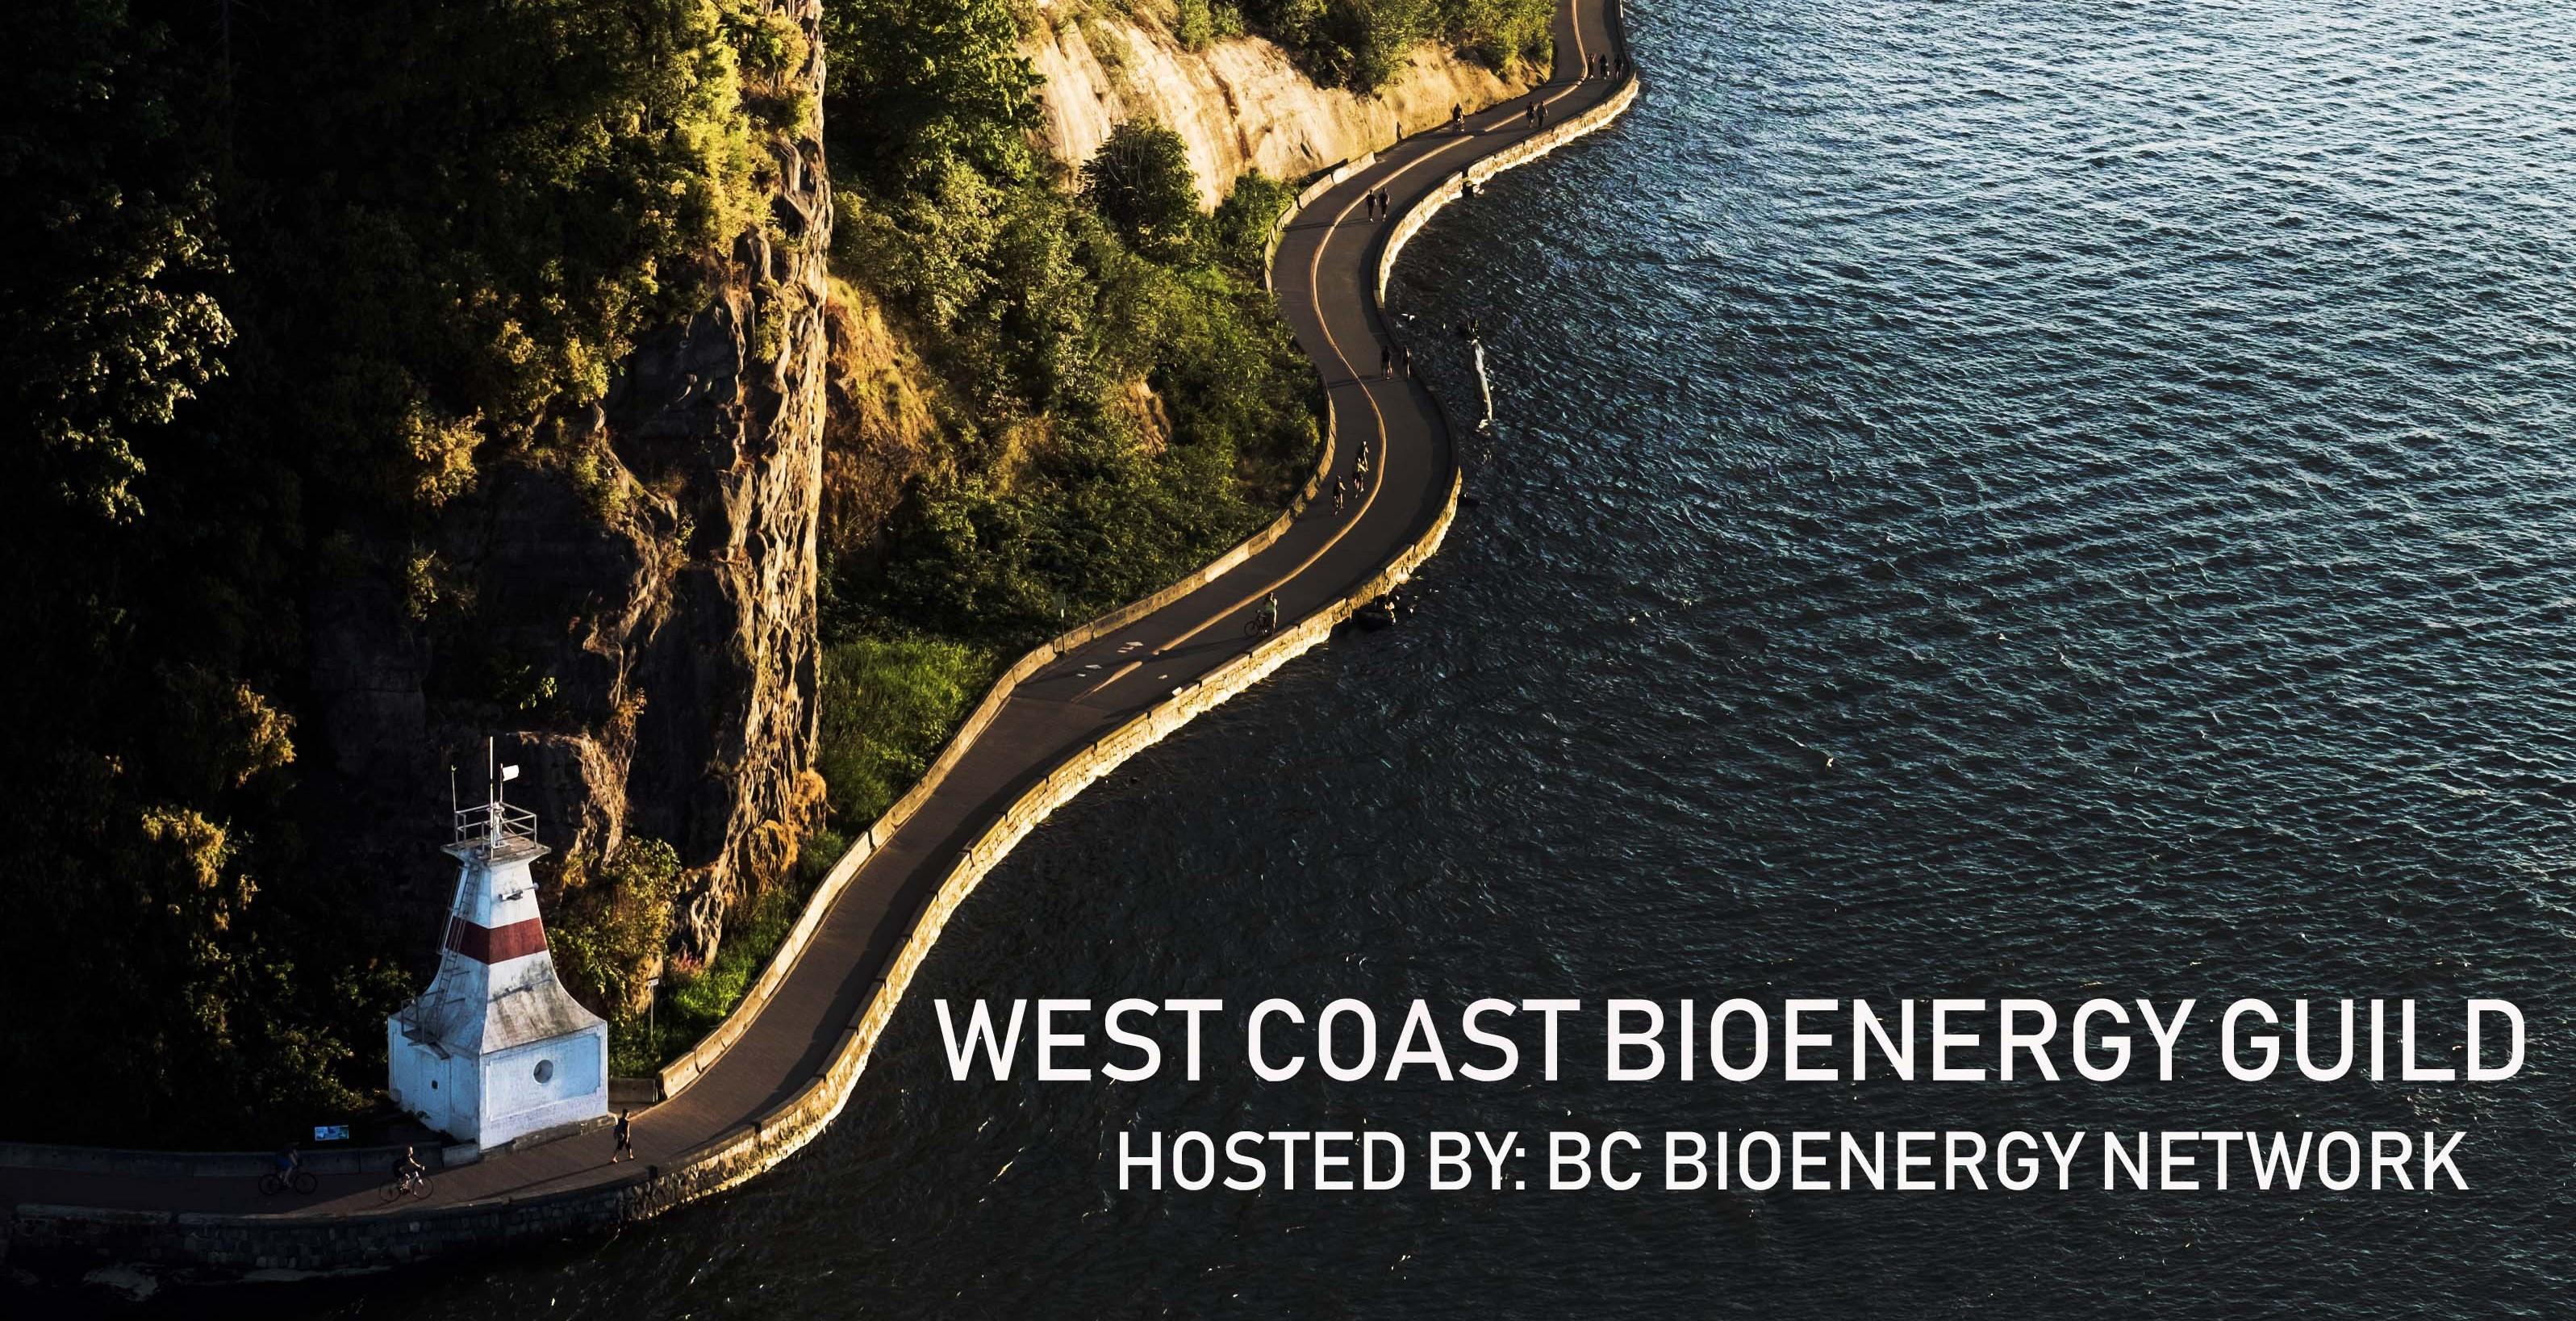 West Coast Bioenergy Guild - April 15th